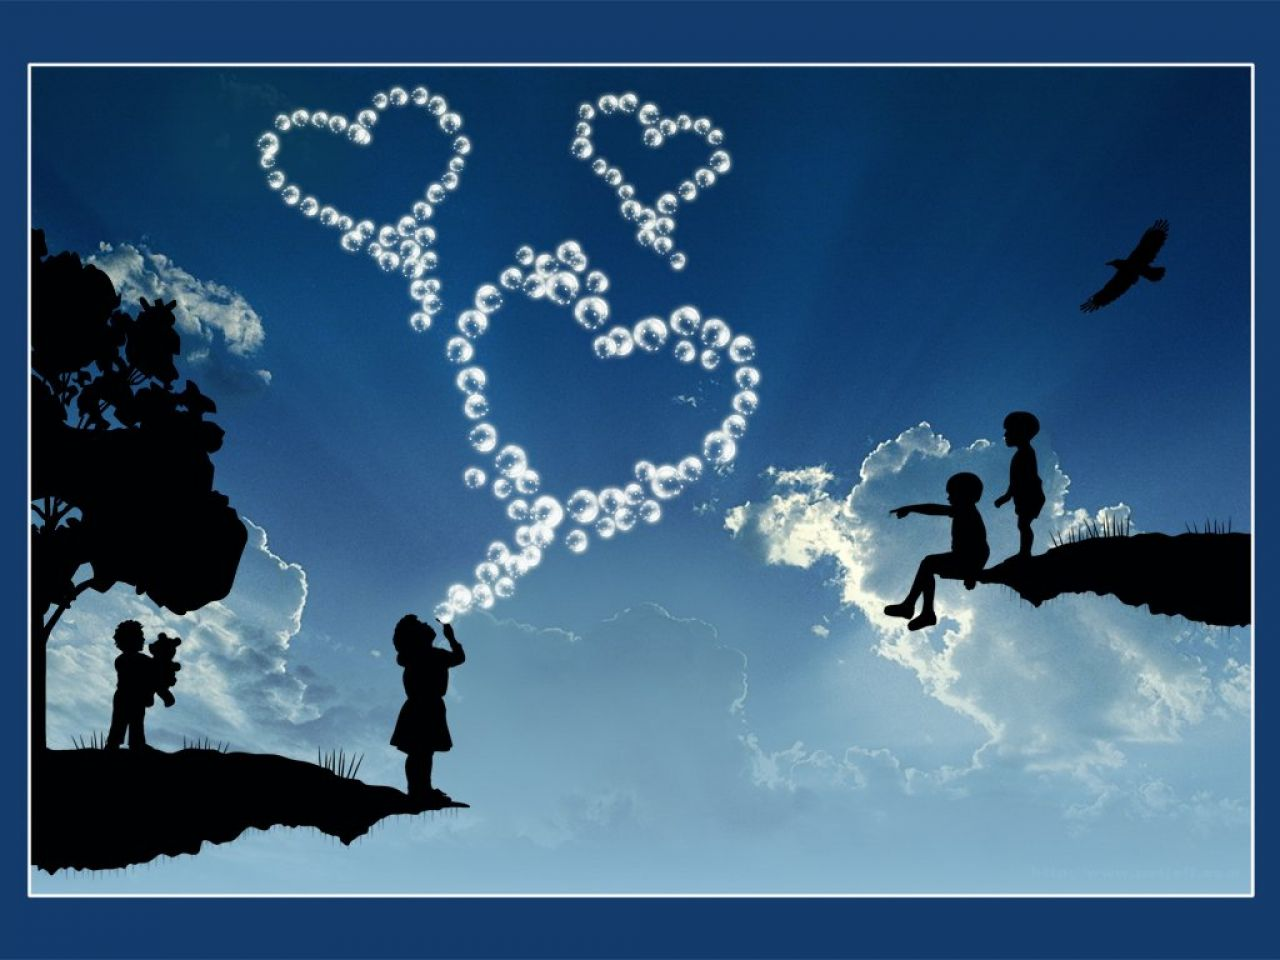 Fond d 39 ecran l 39 amour dans le ciel wallpaper for Fond ecran amour